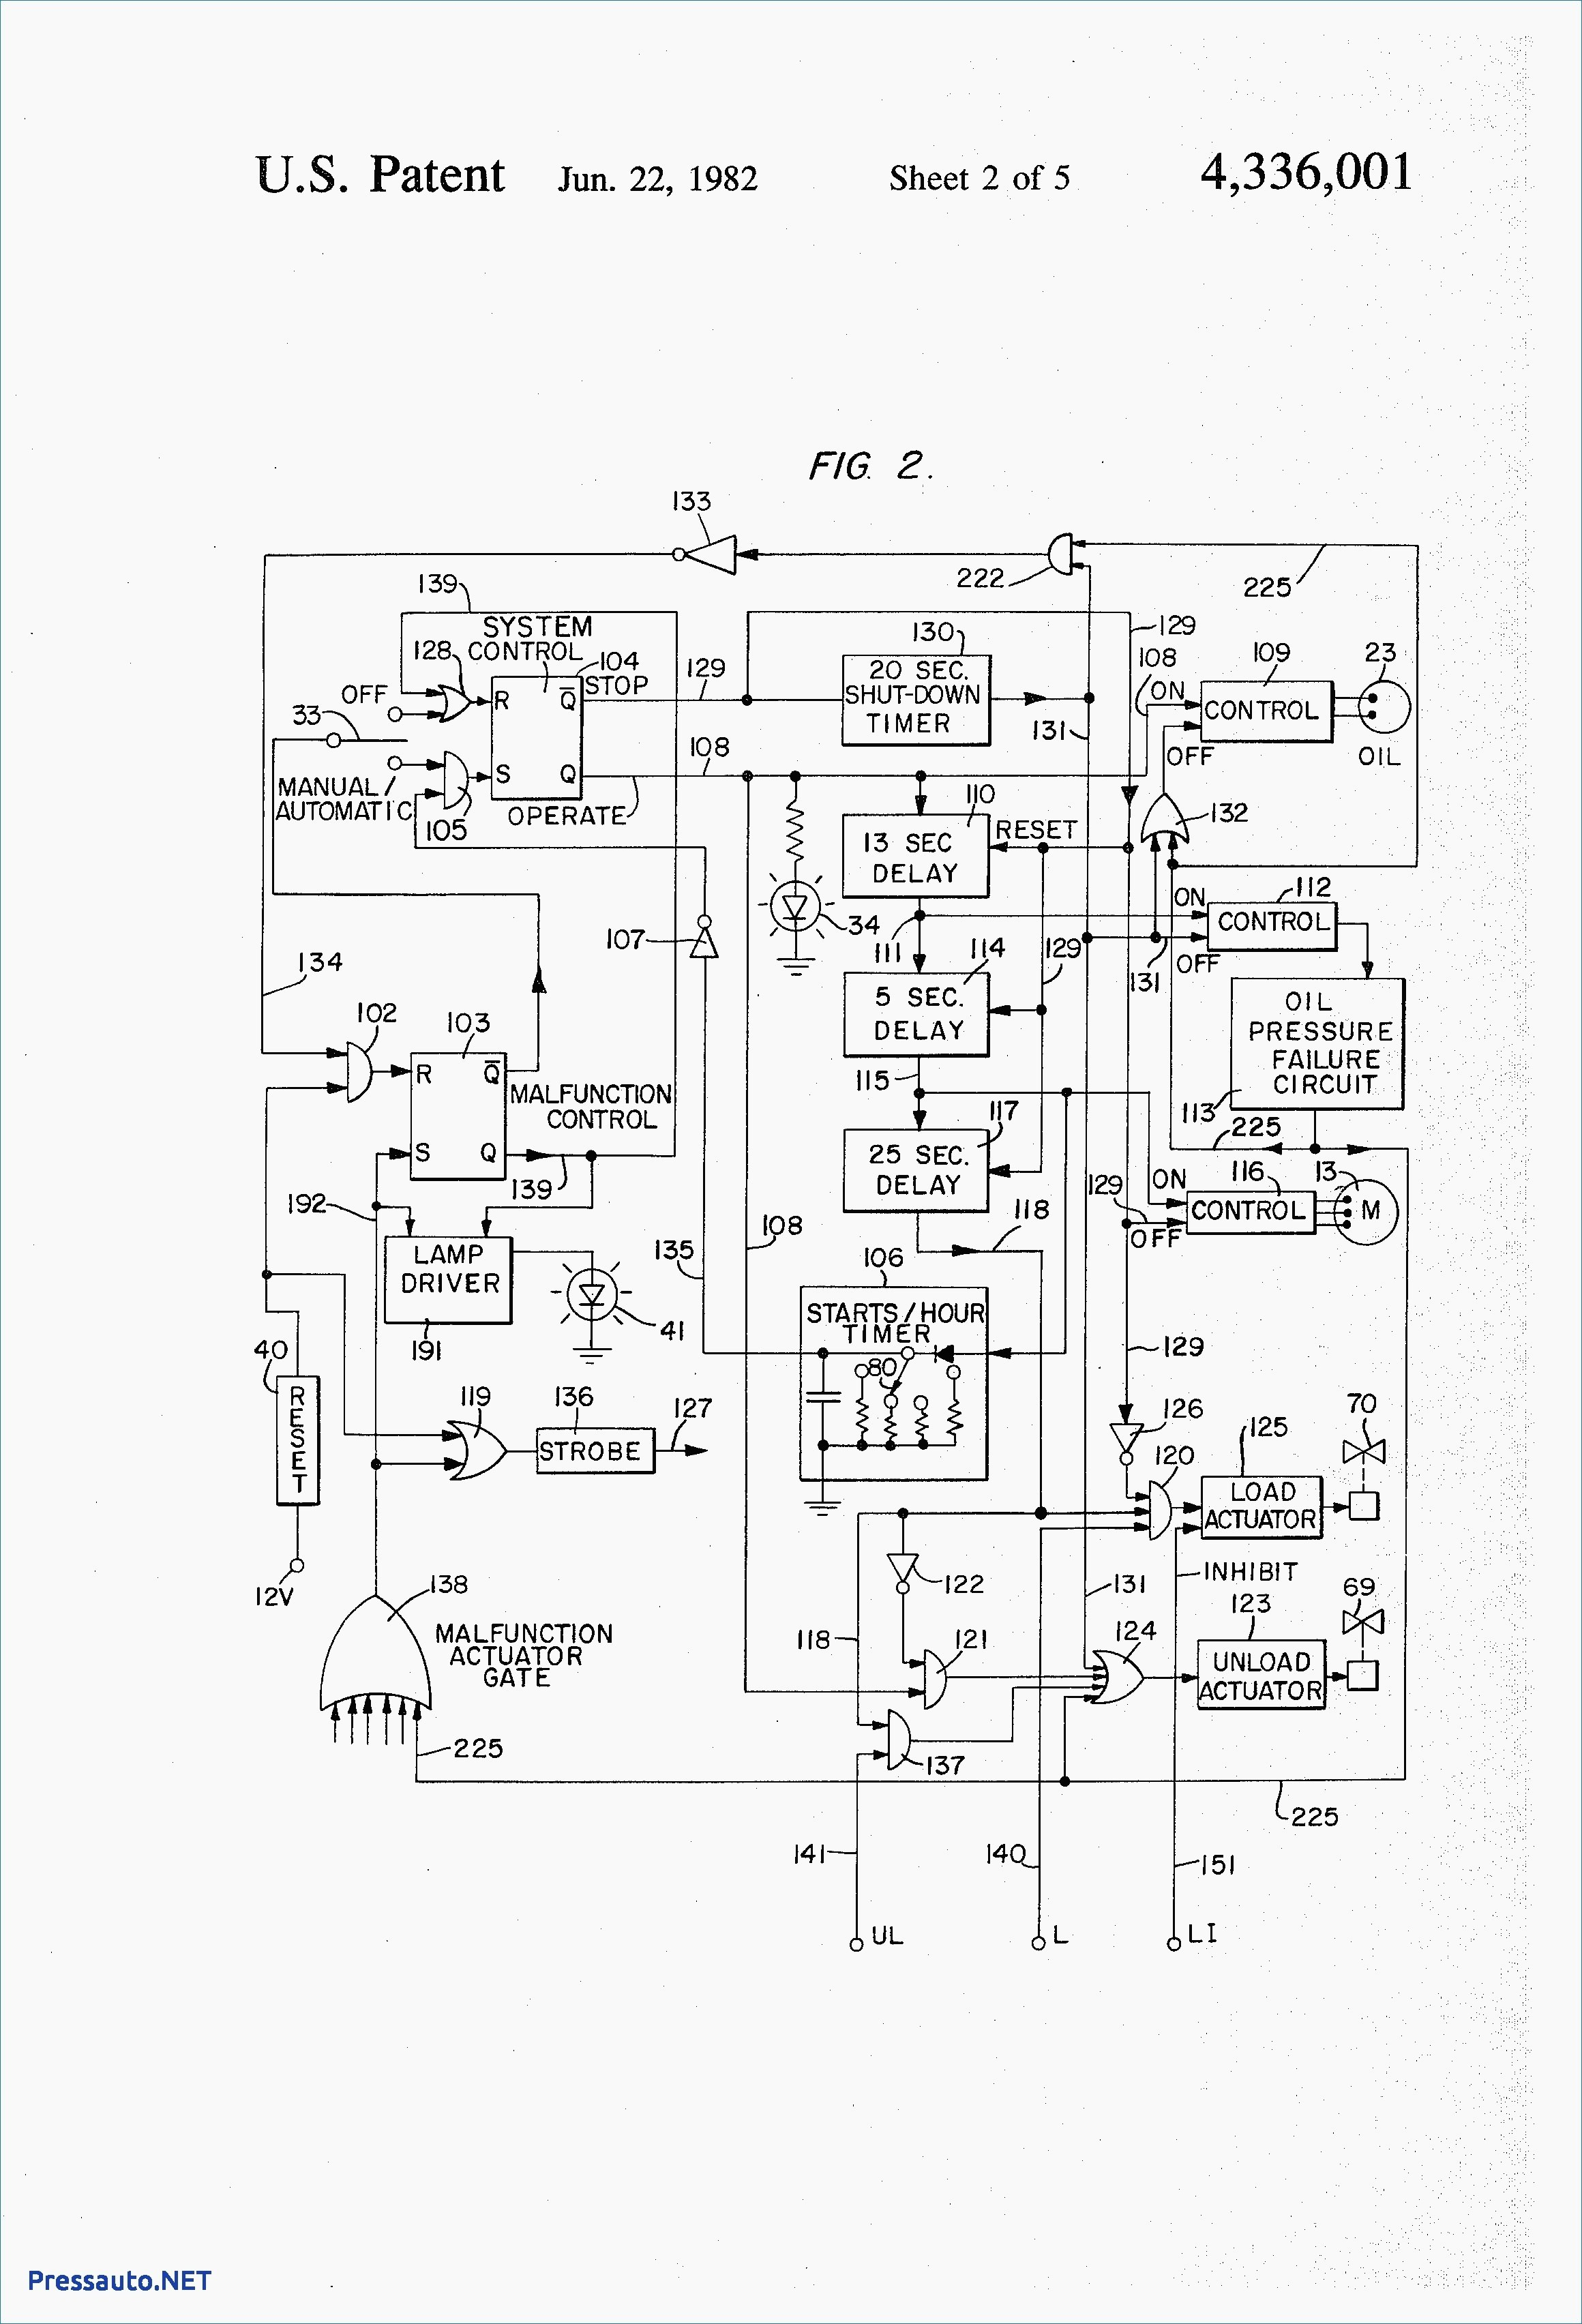 ingersoll rand air compressor wiring diagram my wiring diagram rh detoxicrecenze com ingersoll rand p185wjd wiring diagram ingersoll rand t30 wiring diagram